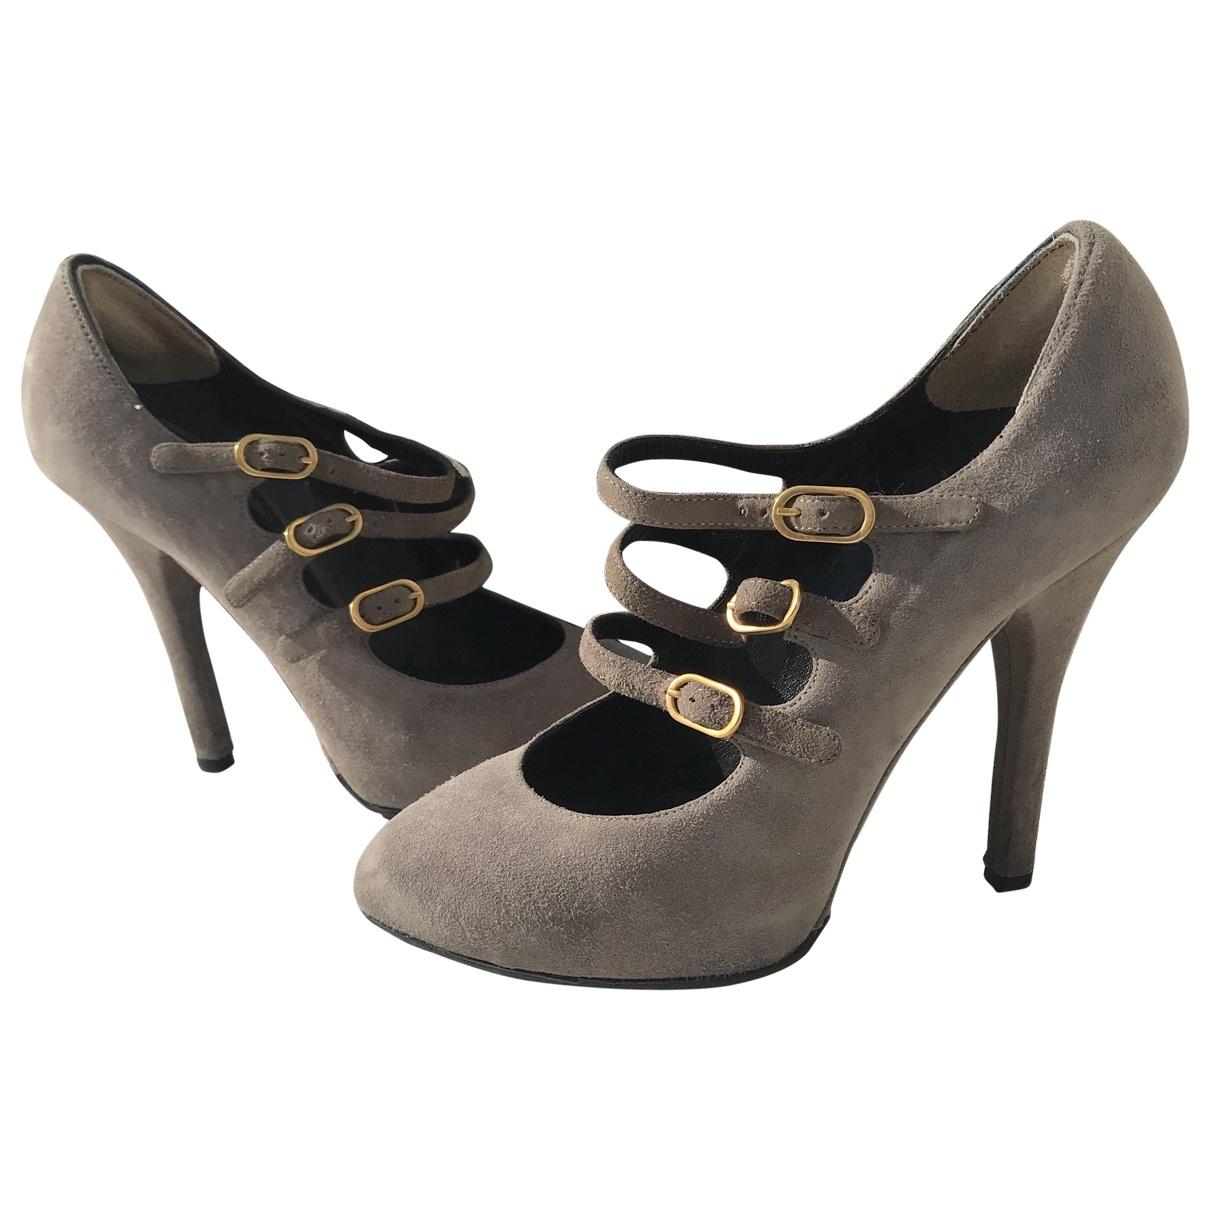 Dolce & Gabbana \N Grey Suede Heels for Women 37 EU